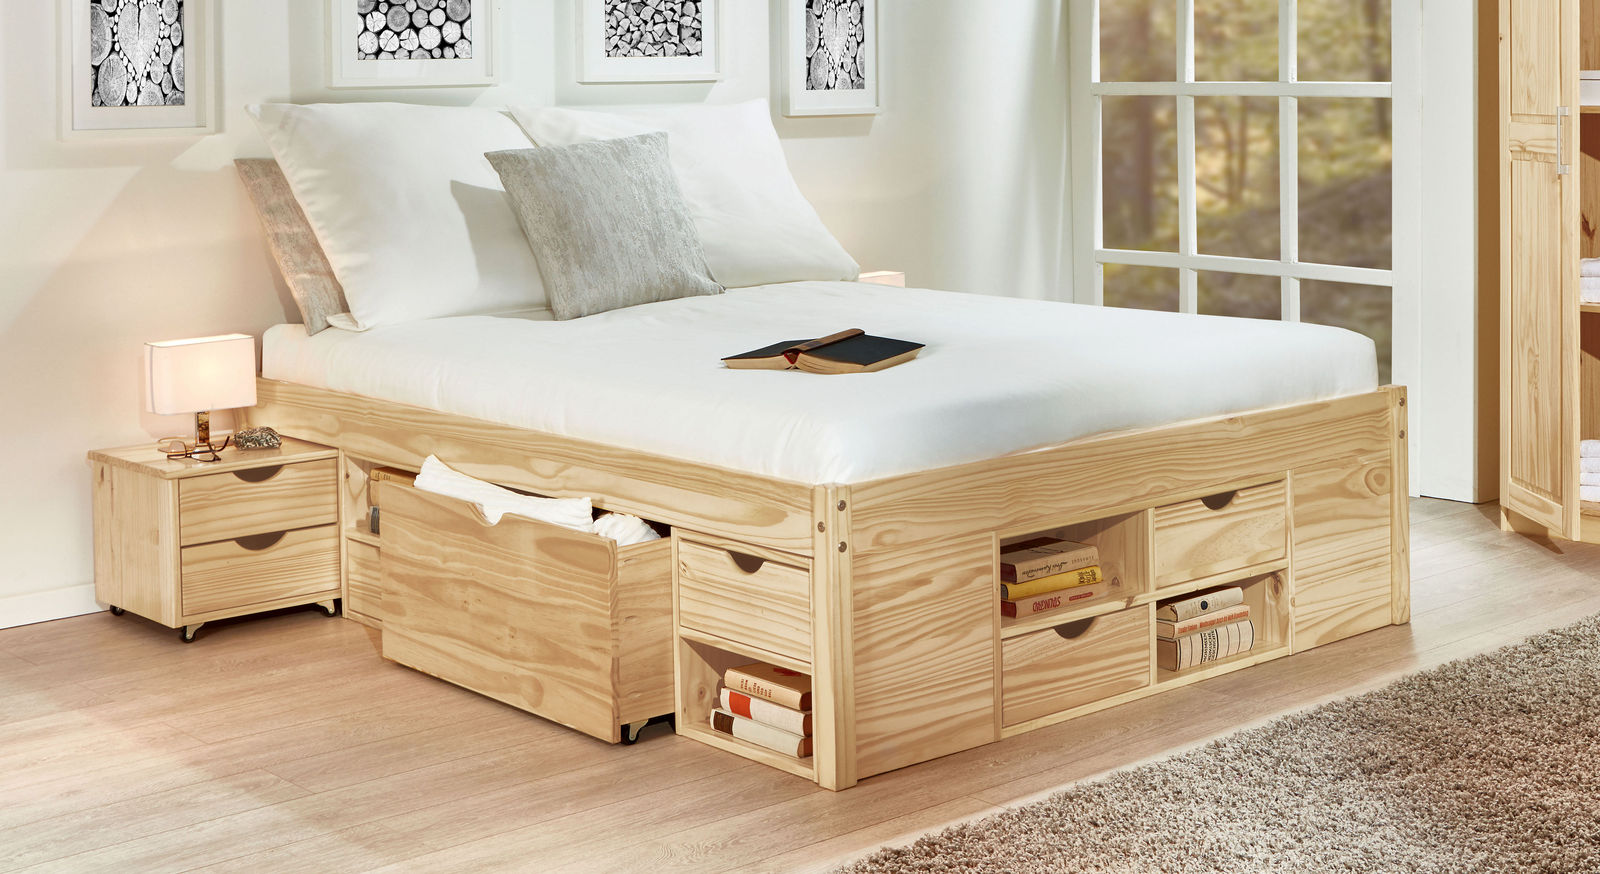 Schubkasten-Bett Oslo aus naturfarbener Kiefer